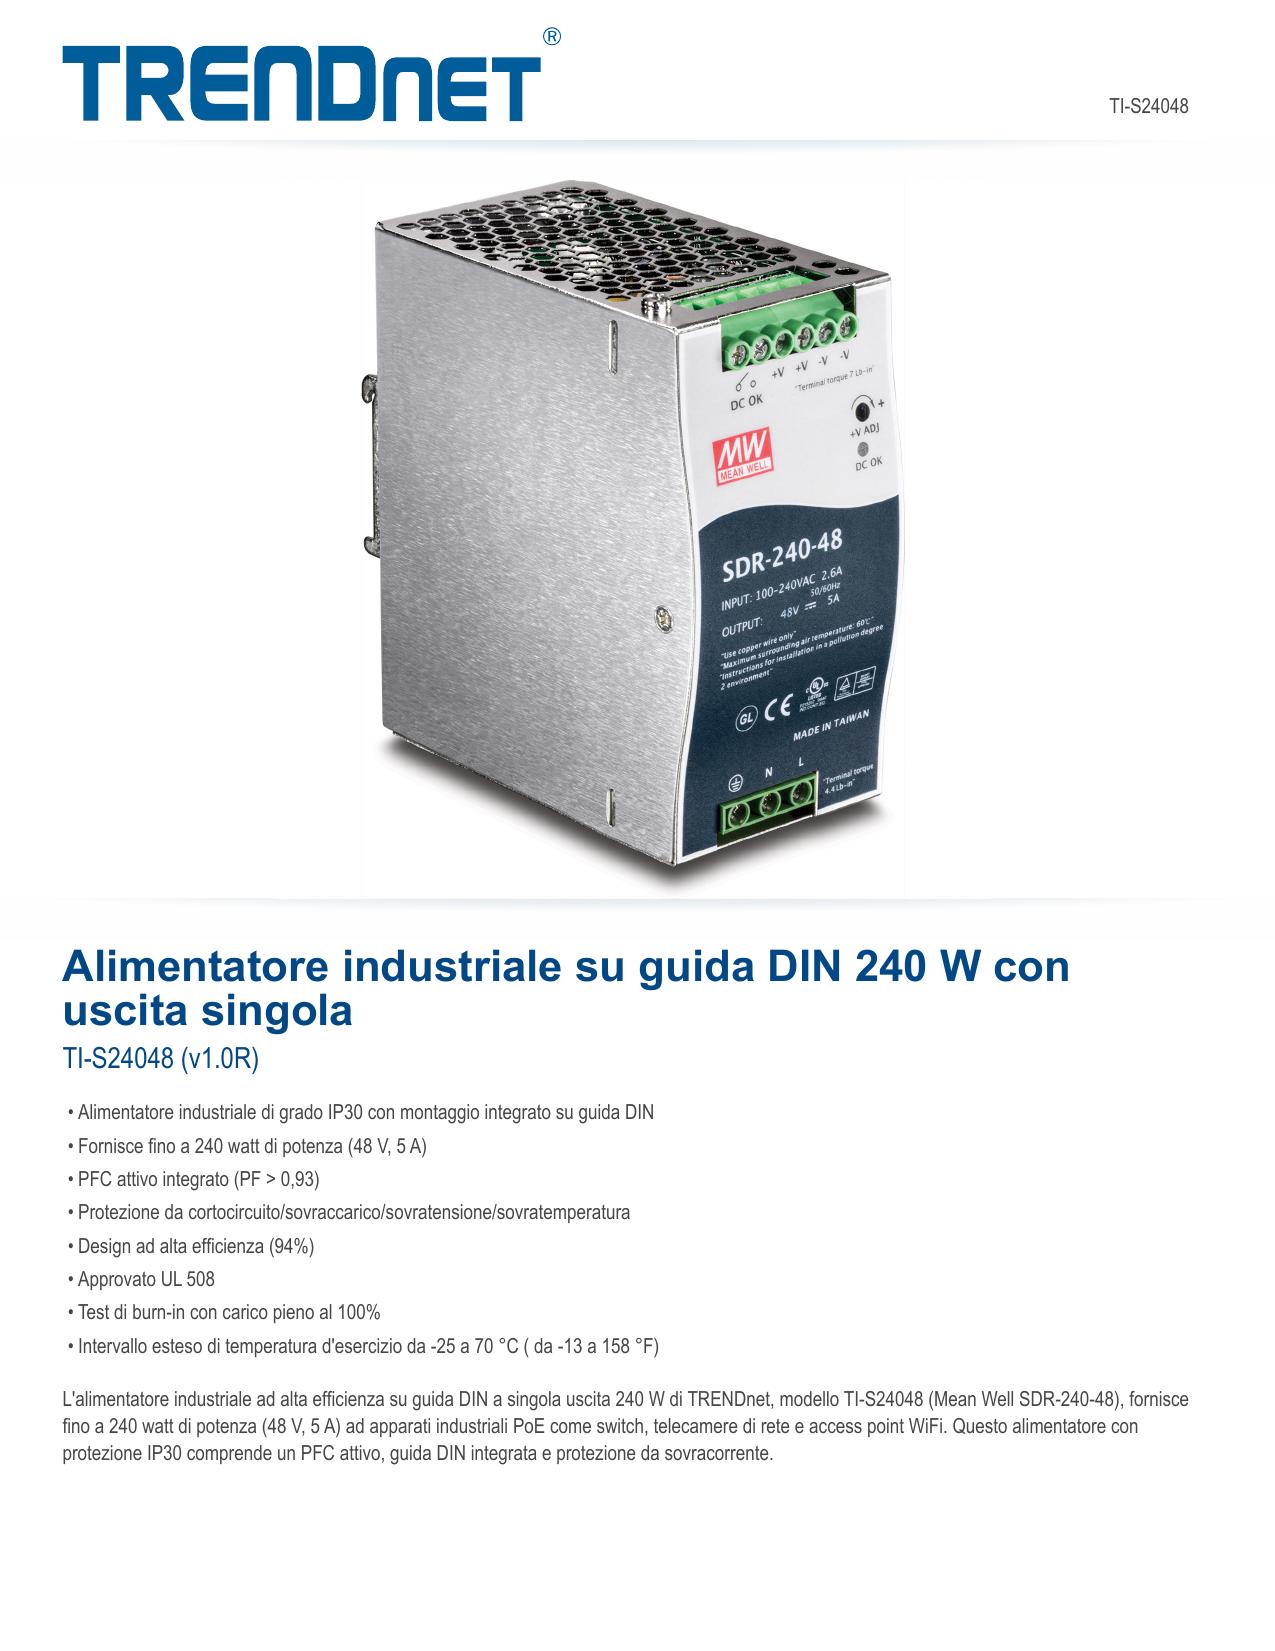 Trendnet TI-S24048 240 W Single Output Industrial DIN-Rail ...